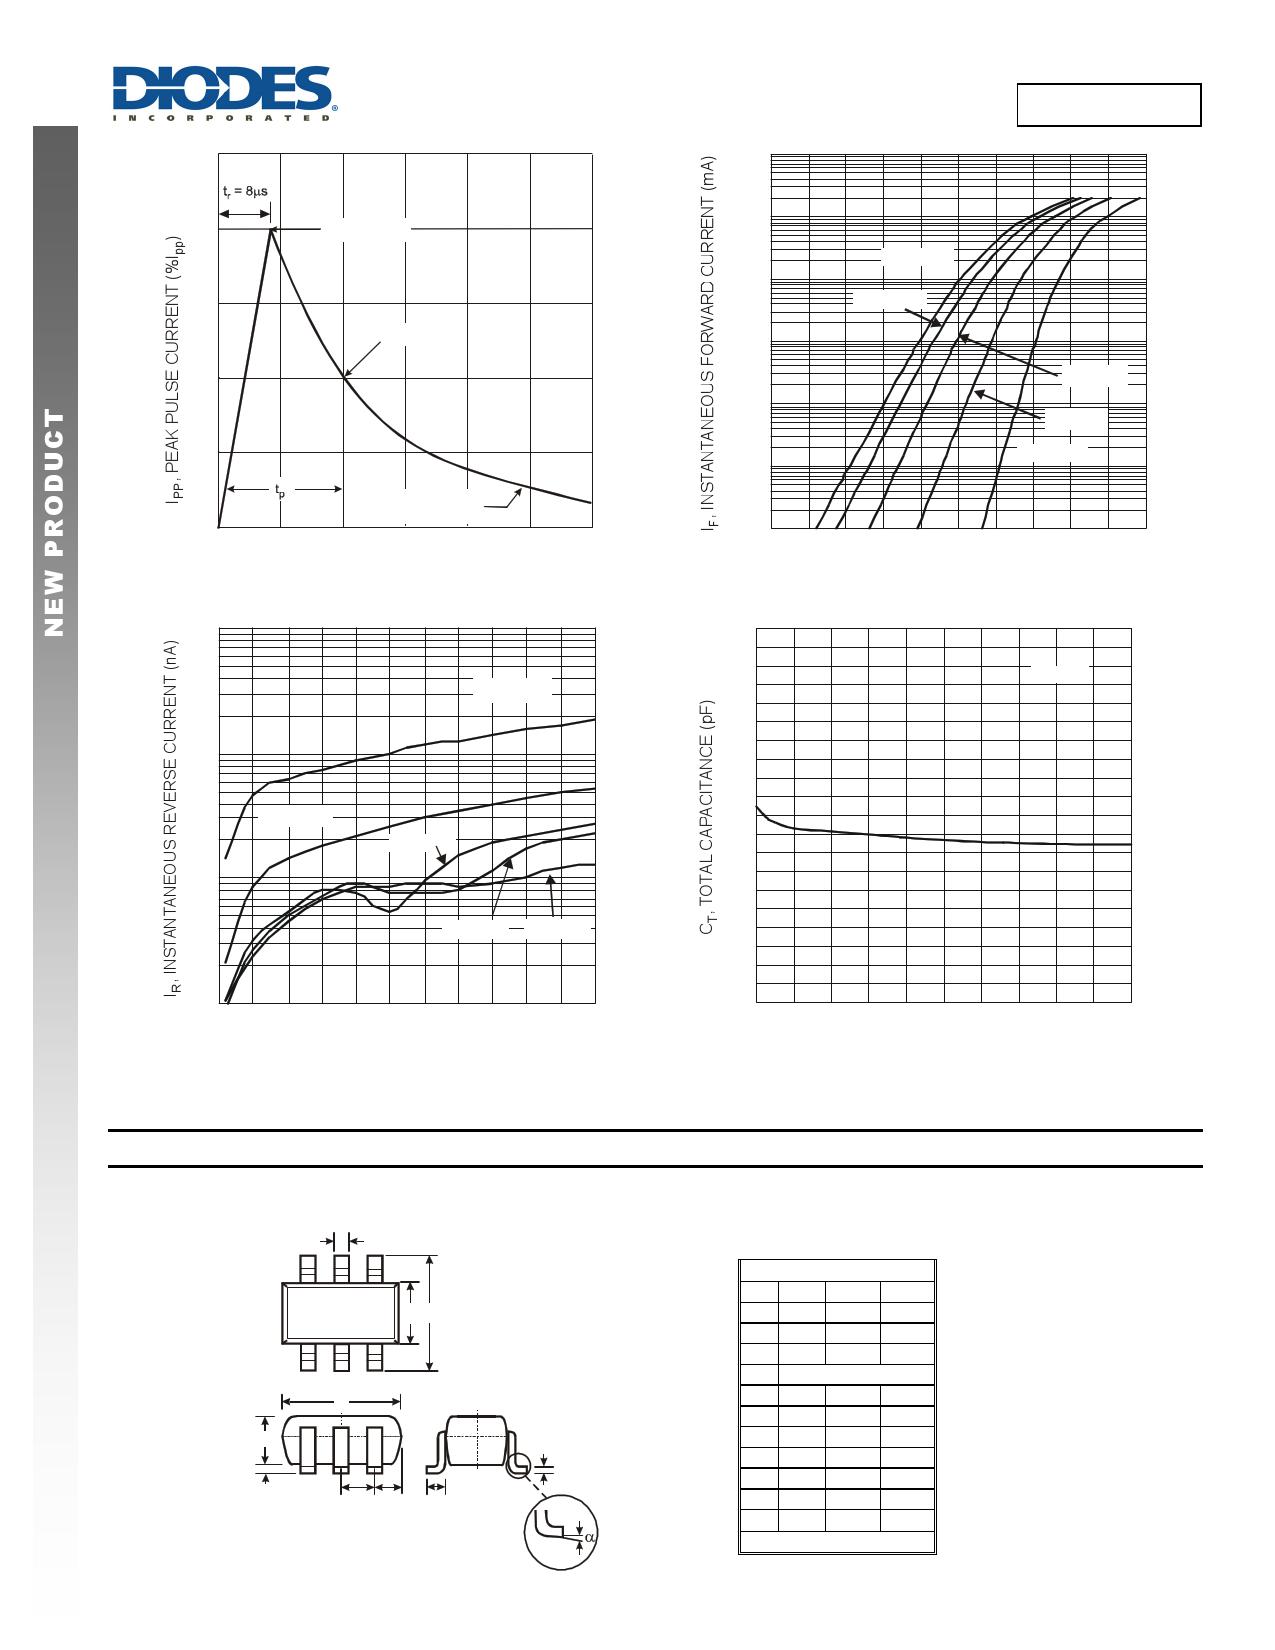 D3V3F4U6S pdf, ピン配列